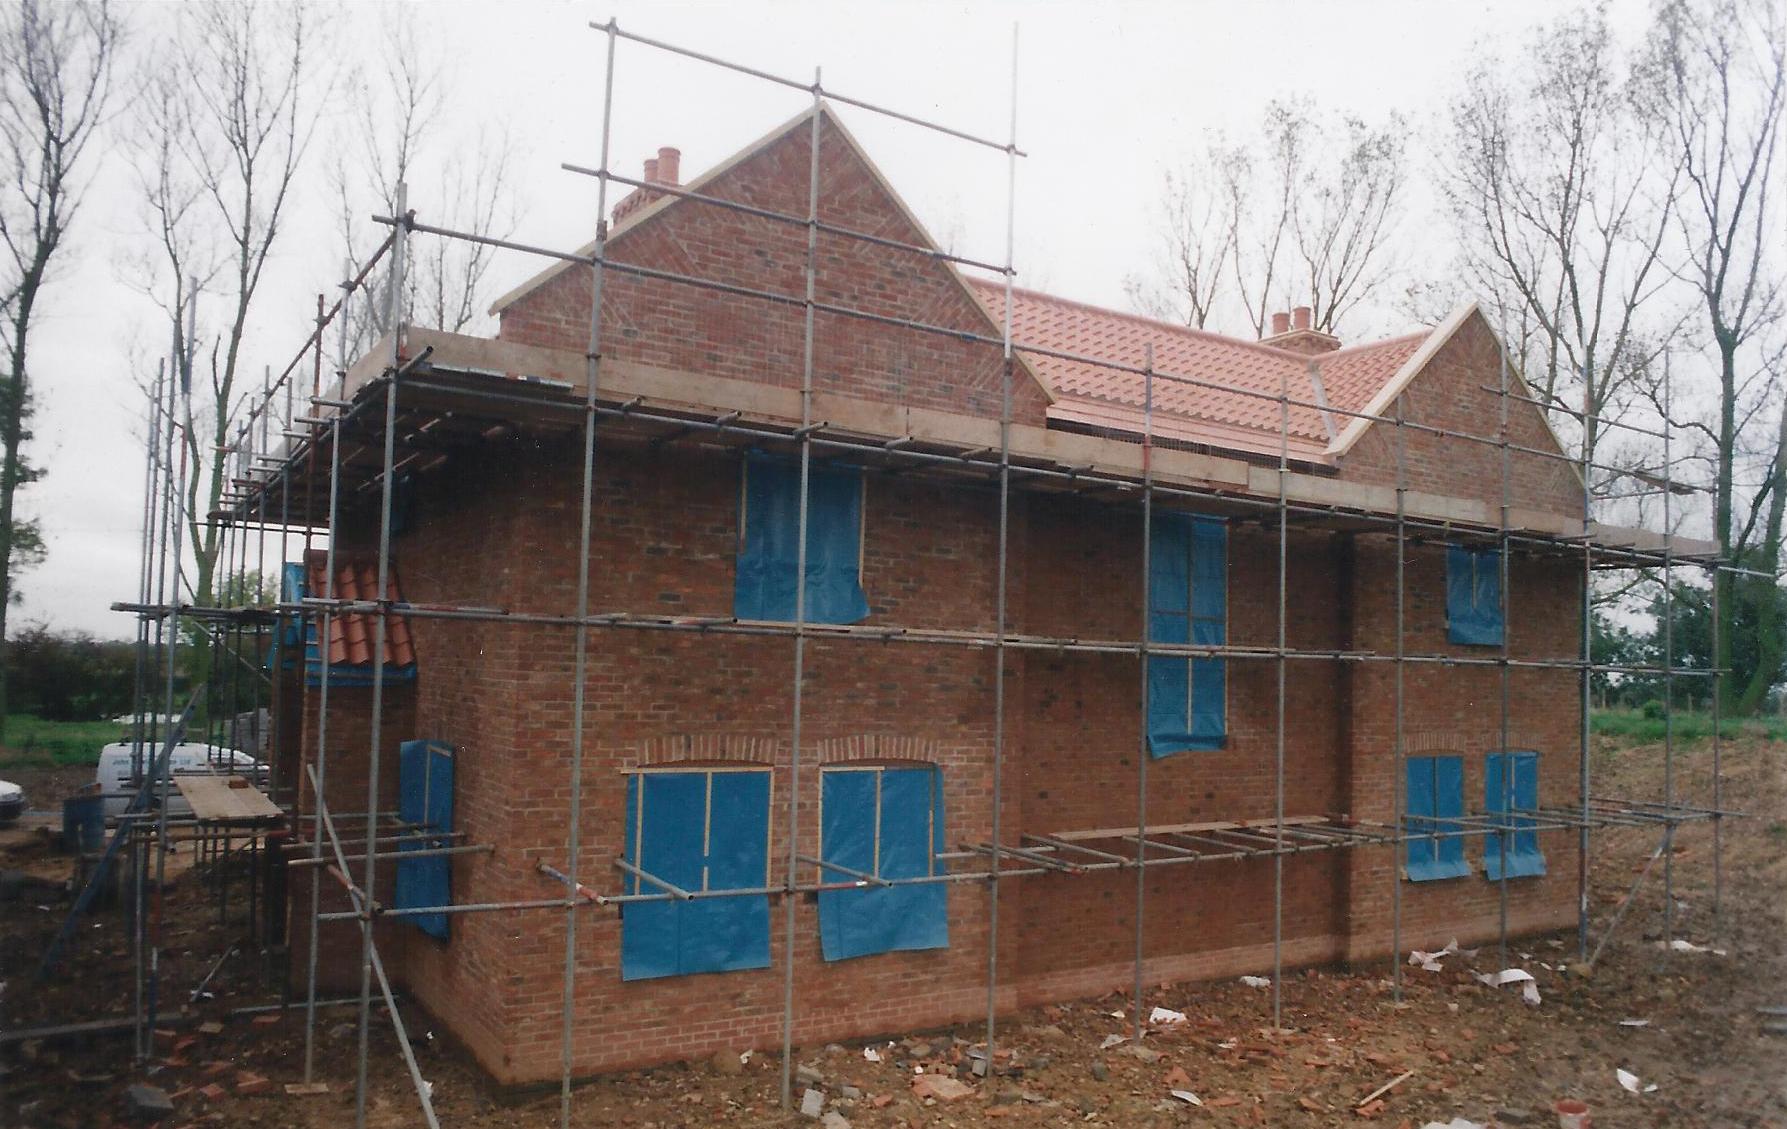 Construction Image 4 - North End Farm - East Yorkshire Architects - Samuel Kendall Associates